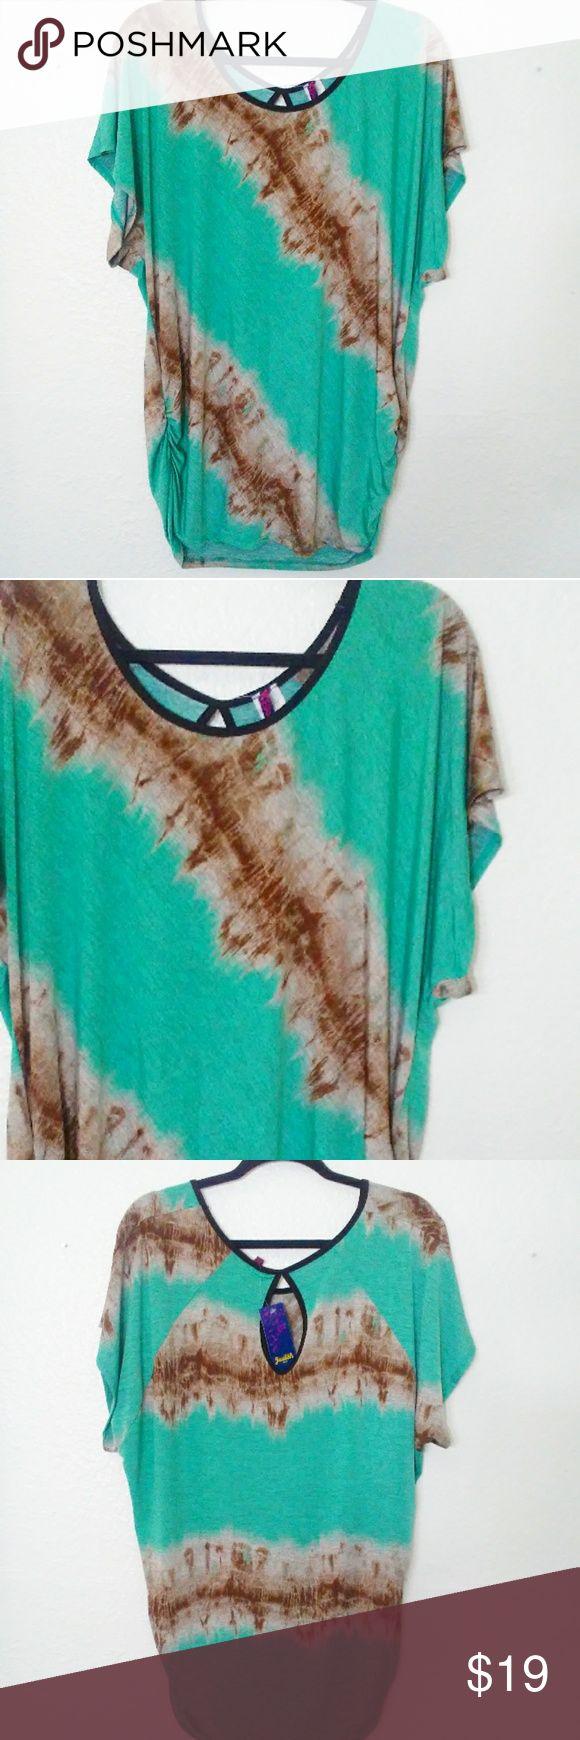 Judith 3X Dark Mint Green Tunic Top New With Tags , Peep hole baa Back. Aize 3X Judith Tops